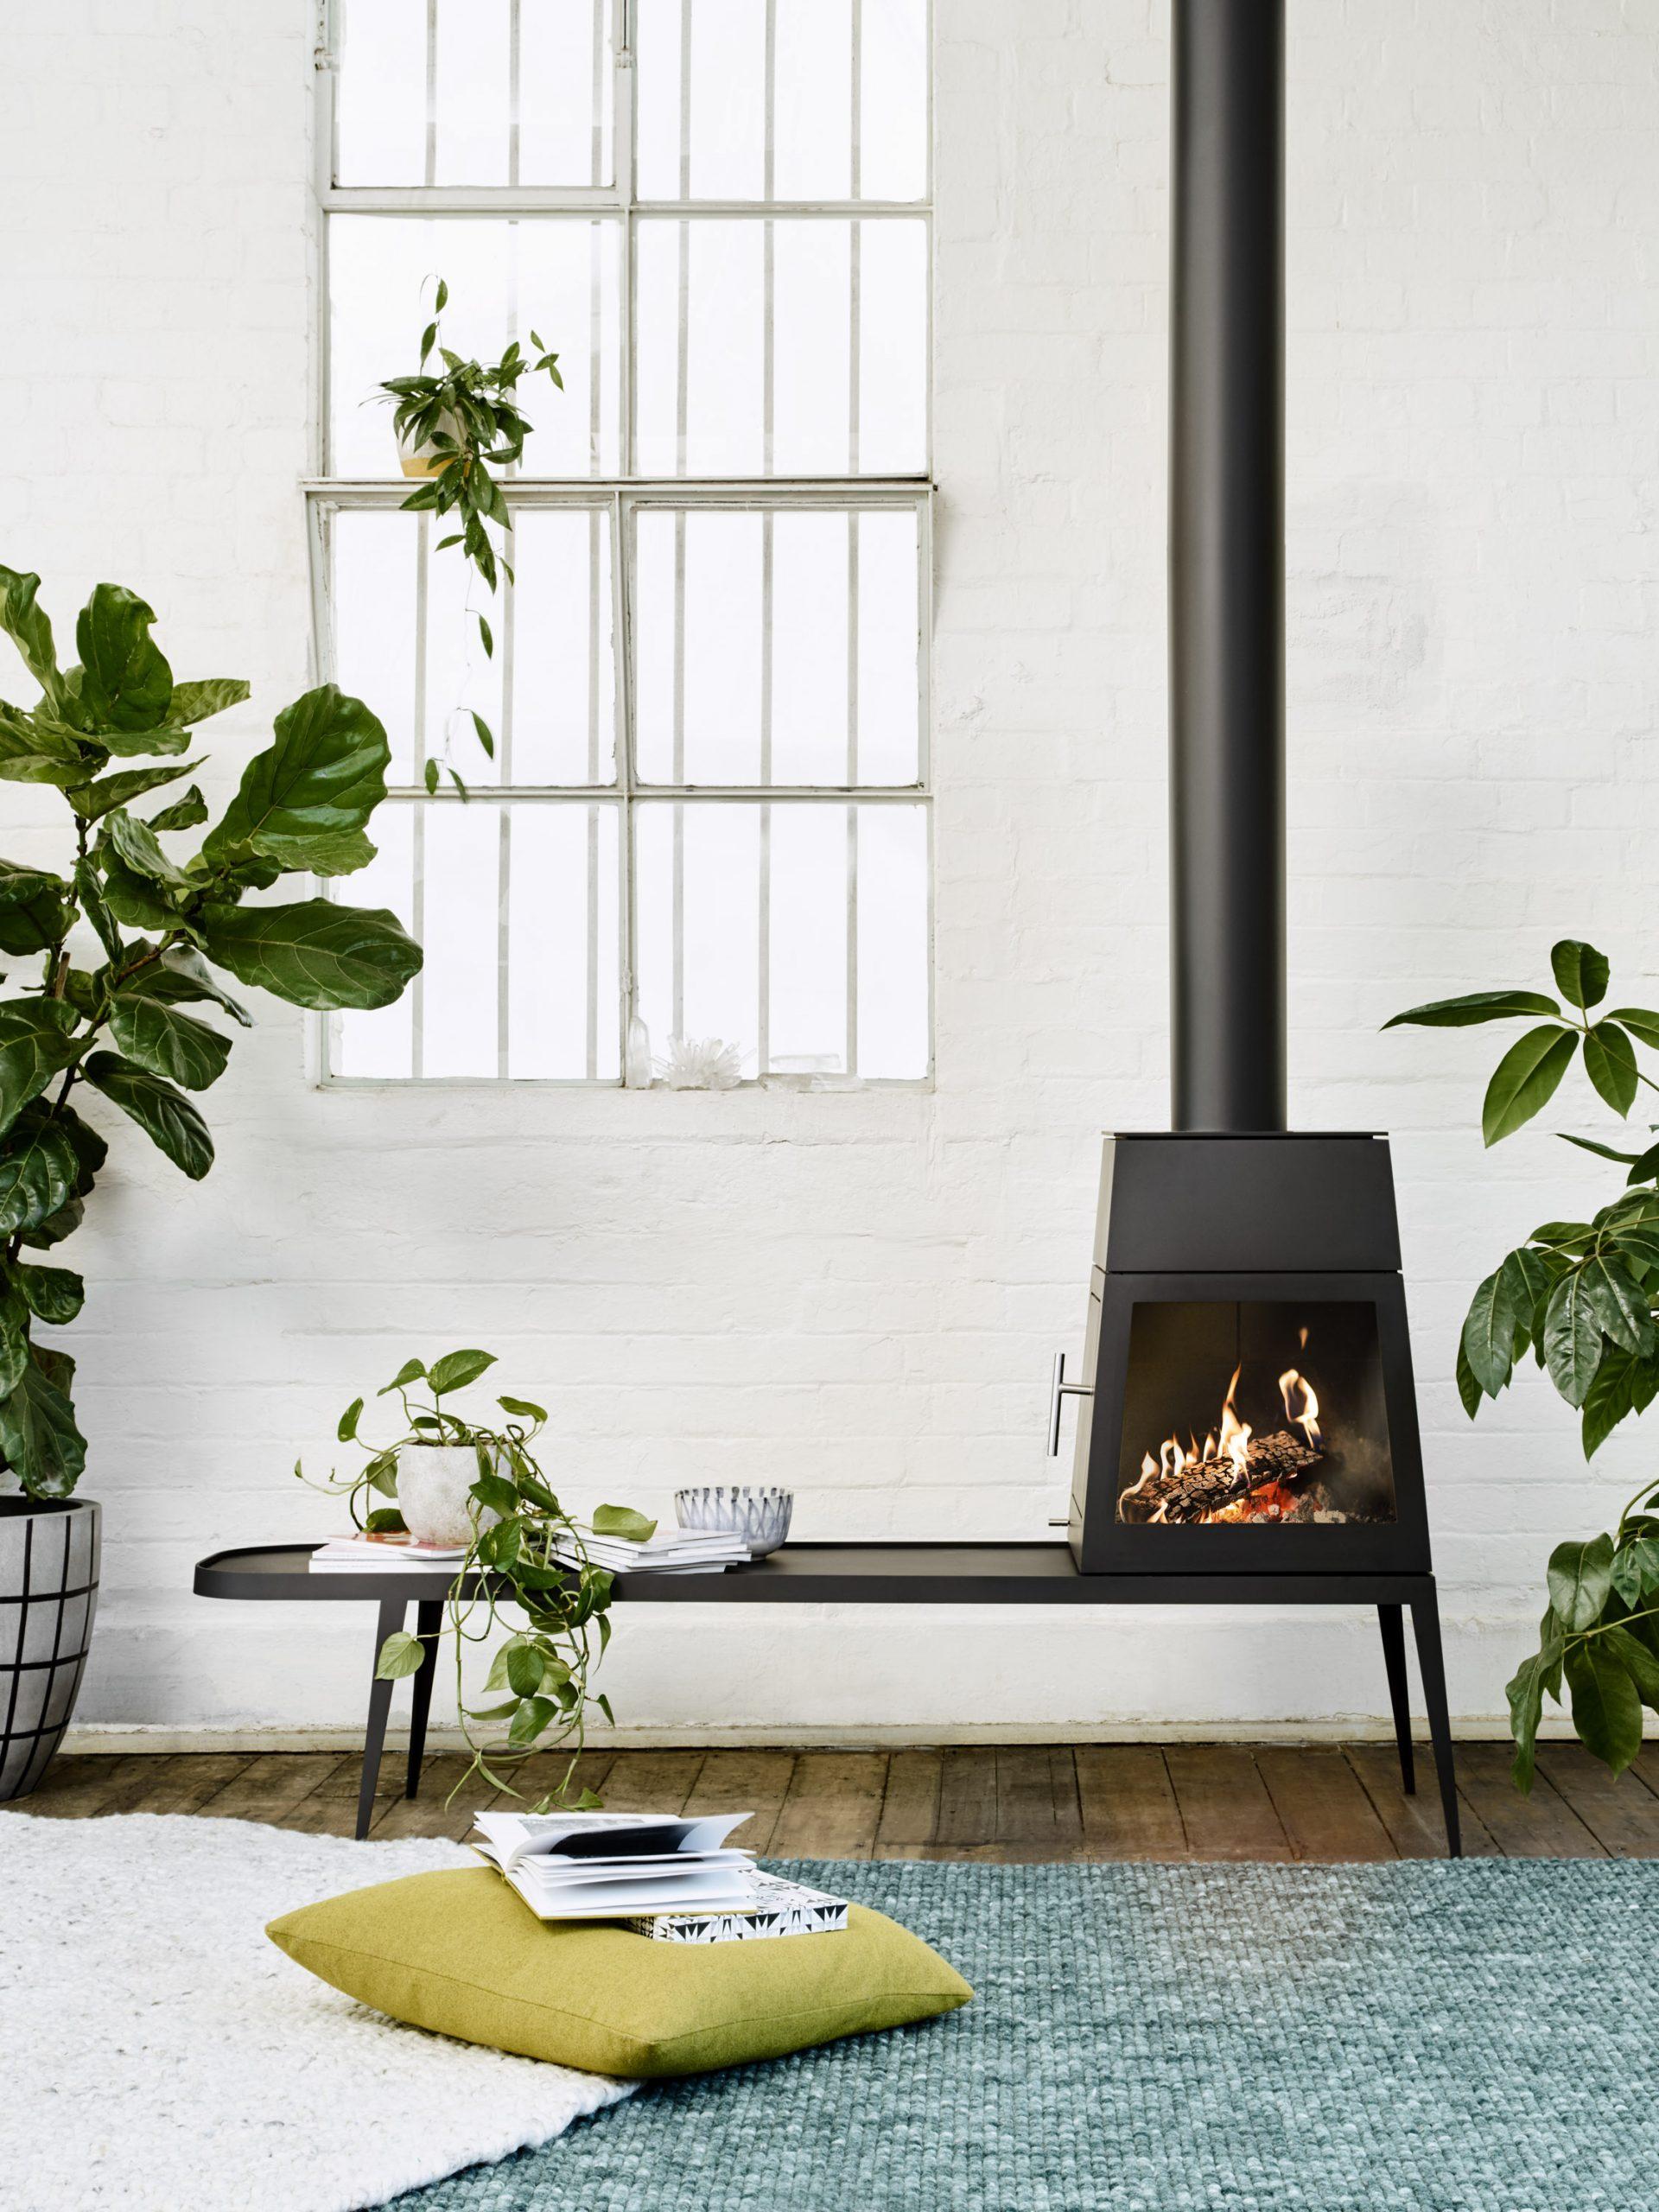 Shaker Fireplace Elegant Shaker Wood Stove by Antonio Citterio